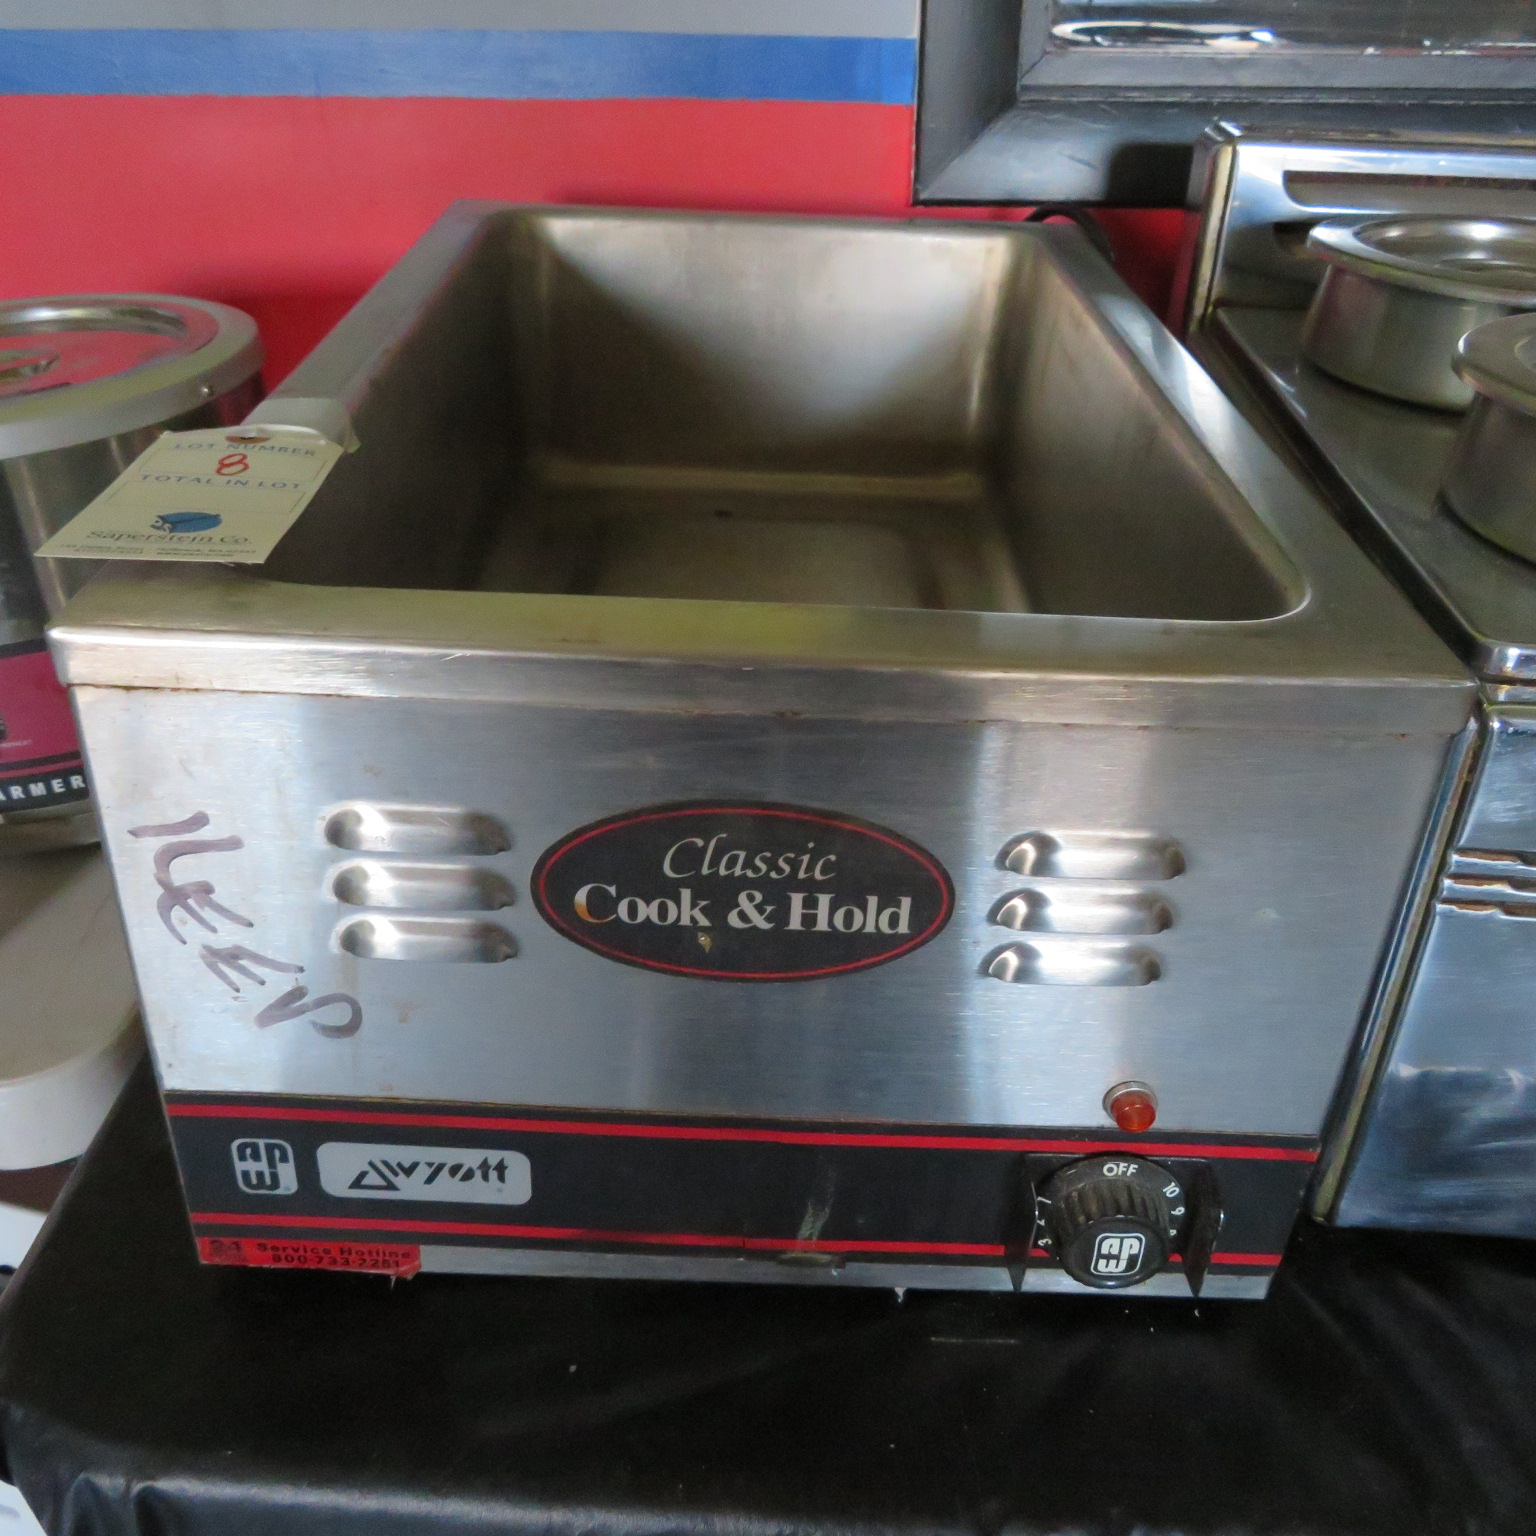 Wyott Counter Top full Pan Warmer